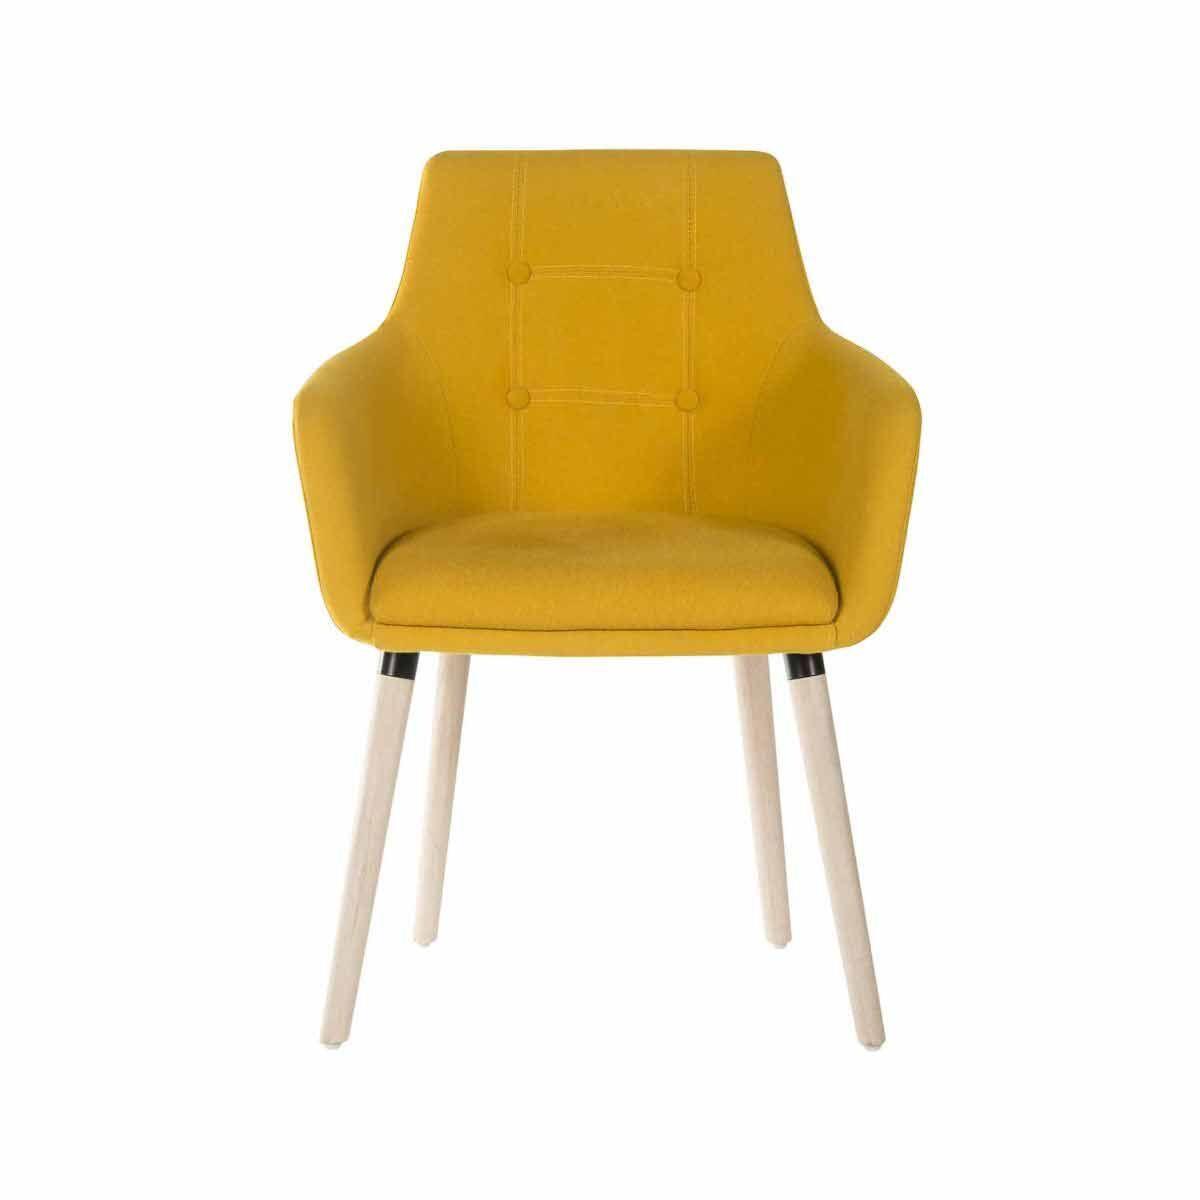 Teknik Office Four Legged Soft Padded Office Chair with Oak Effect Legs Yellow